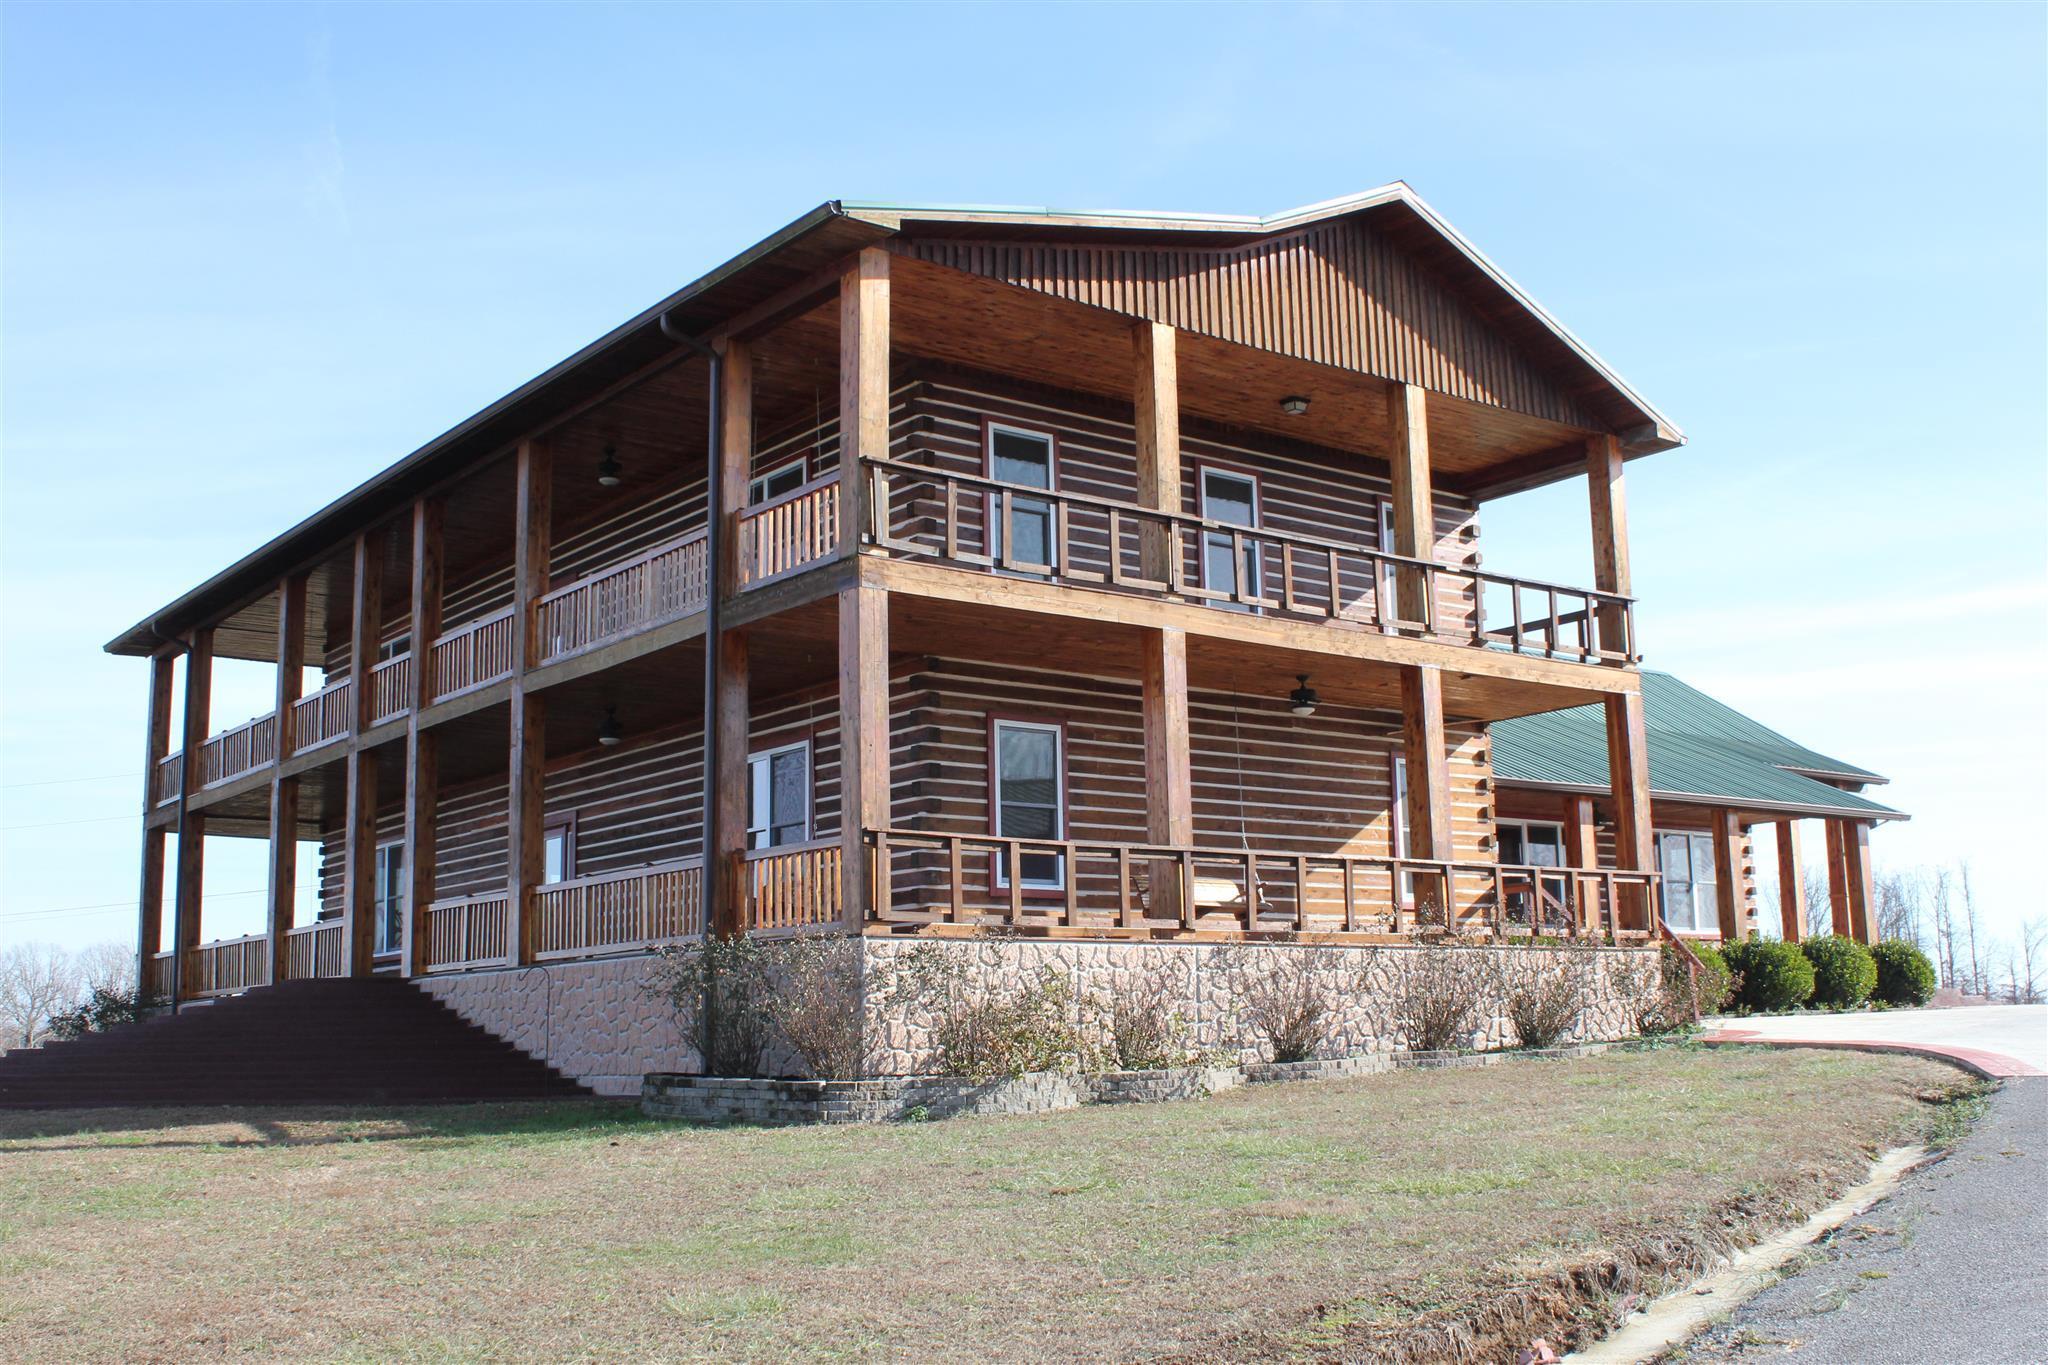 1141 CAMPGROUND DRIVE, Clarkrange, TN 38553 - Clarkrange, TN real estate listing